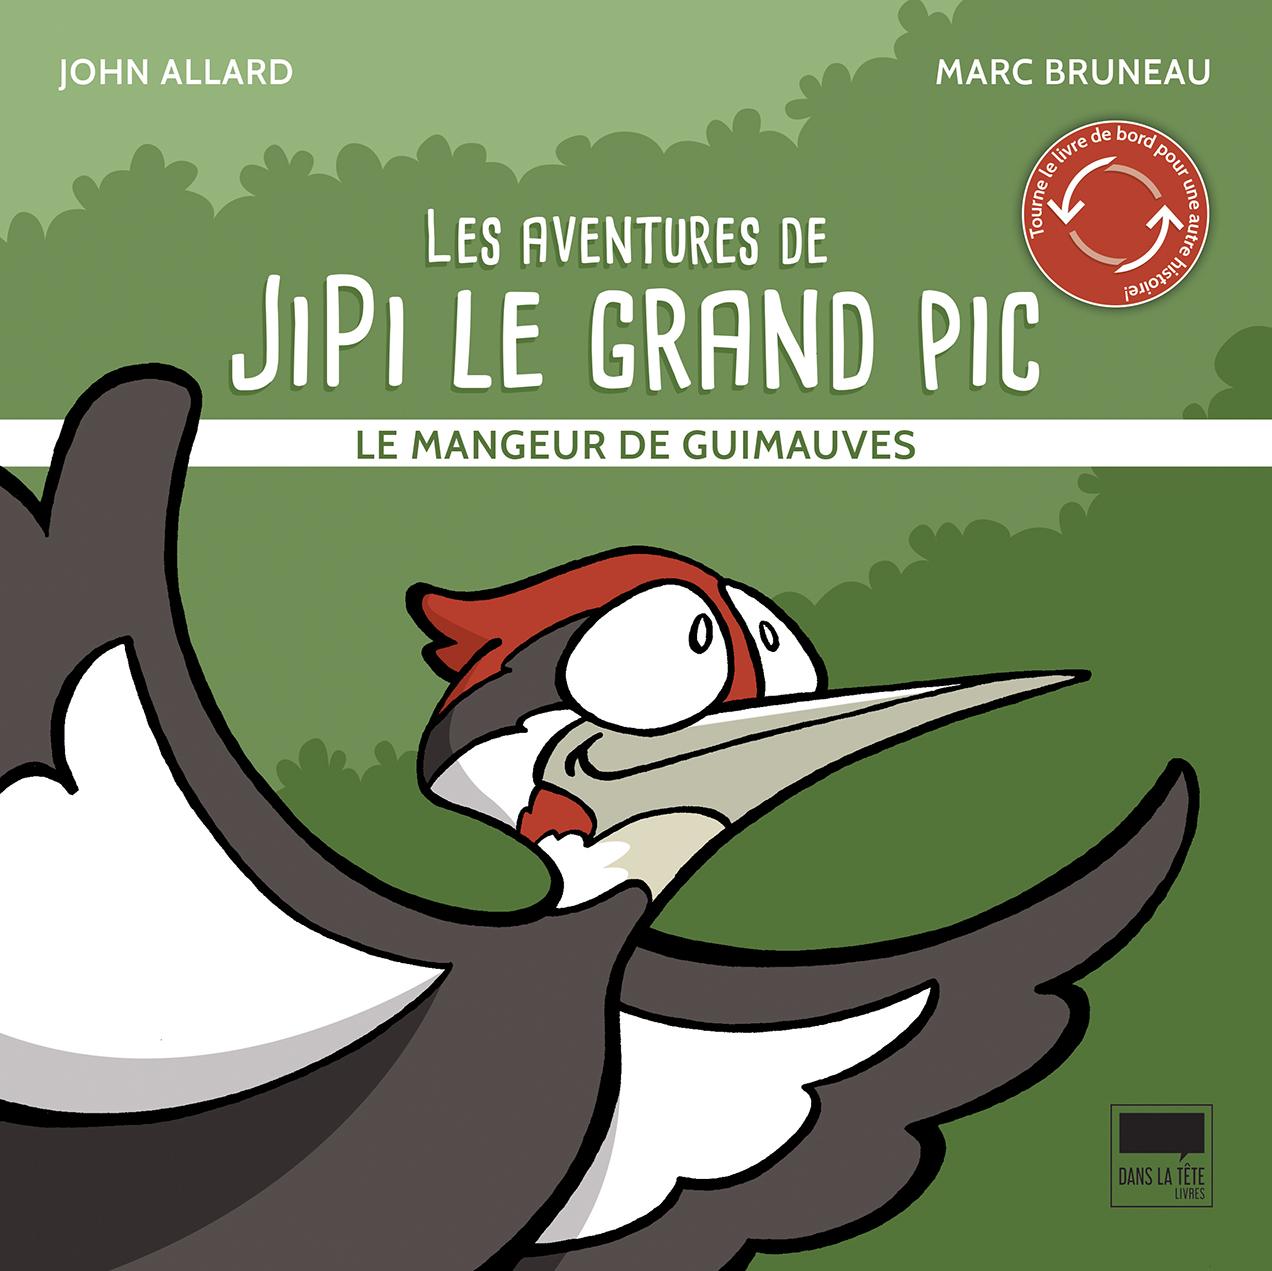 Les aventures de Jipi le grand pic